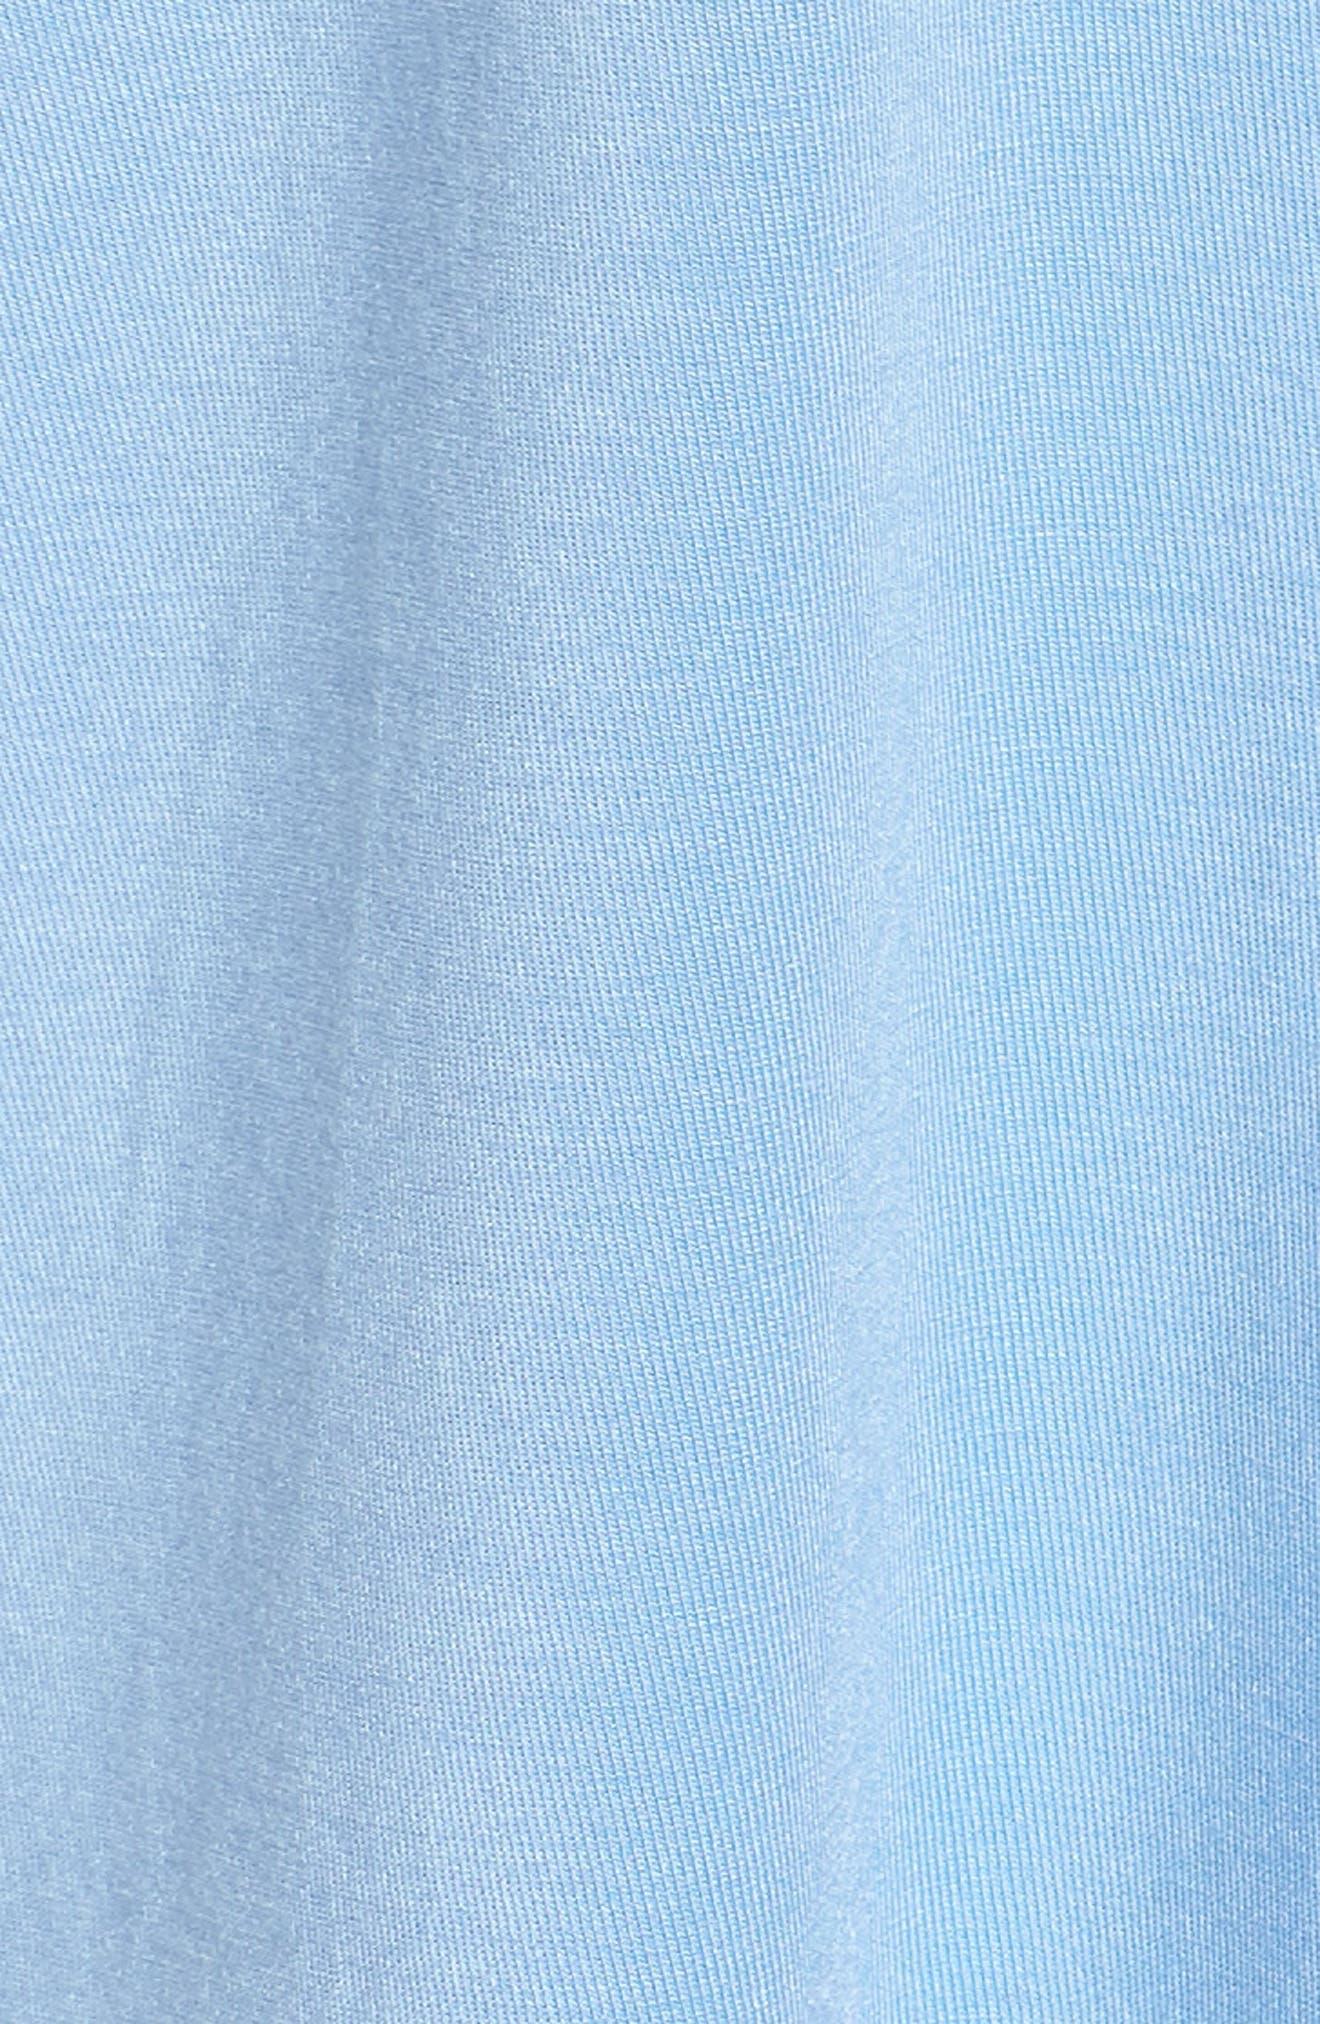 Moonlight Shortie Pajamas,                             Alternate thumbnail 5, color,                             421